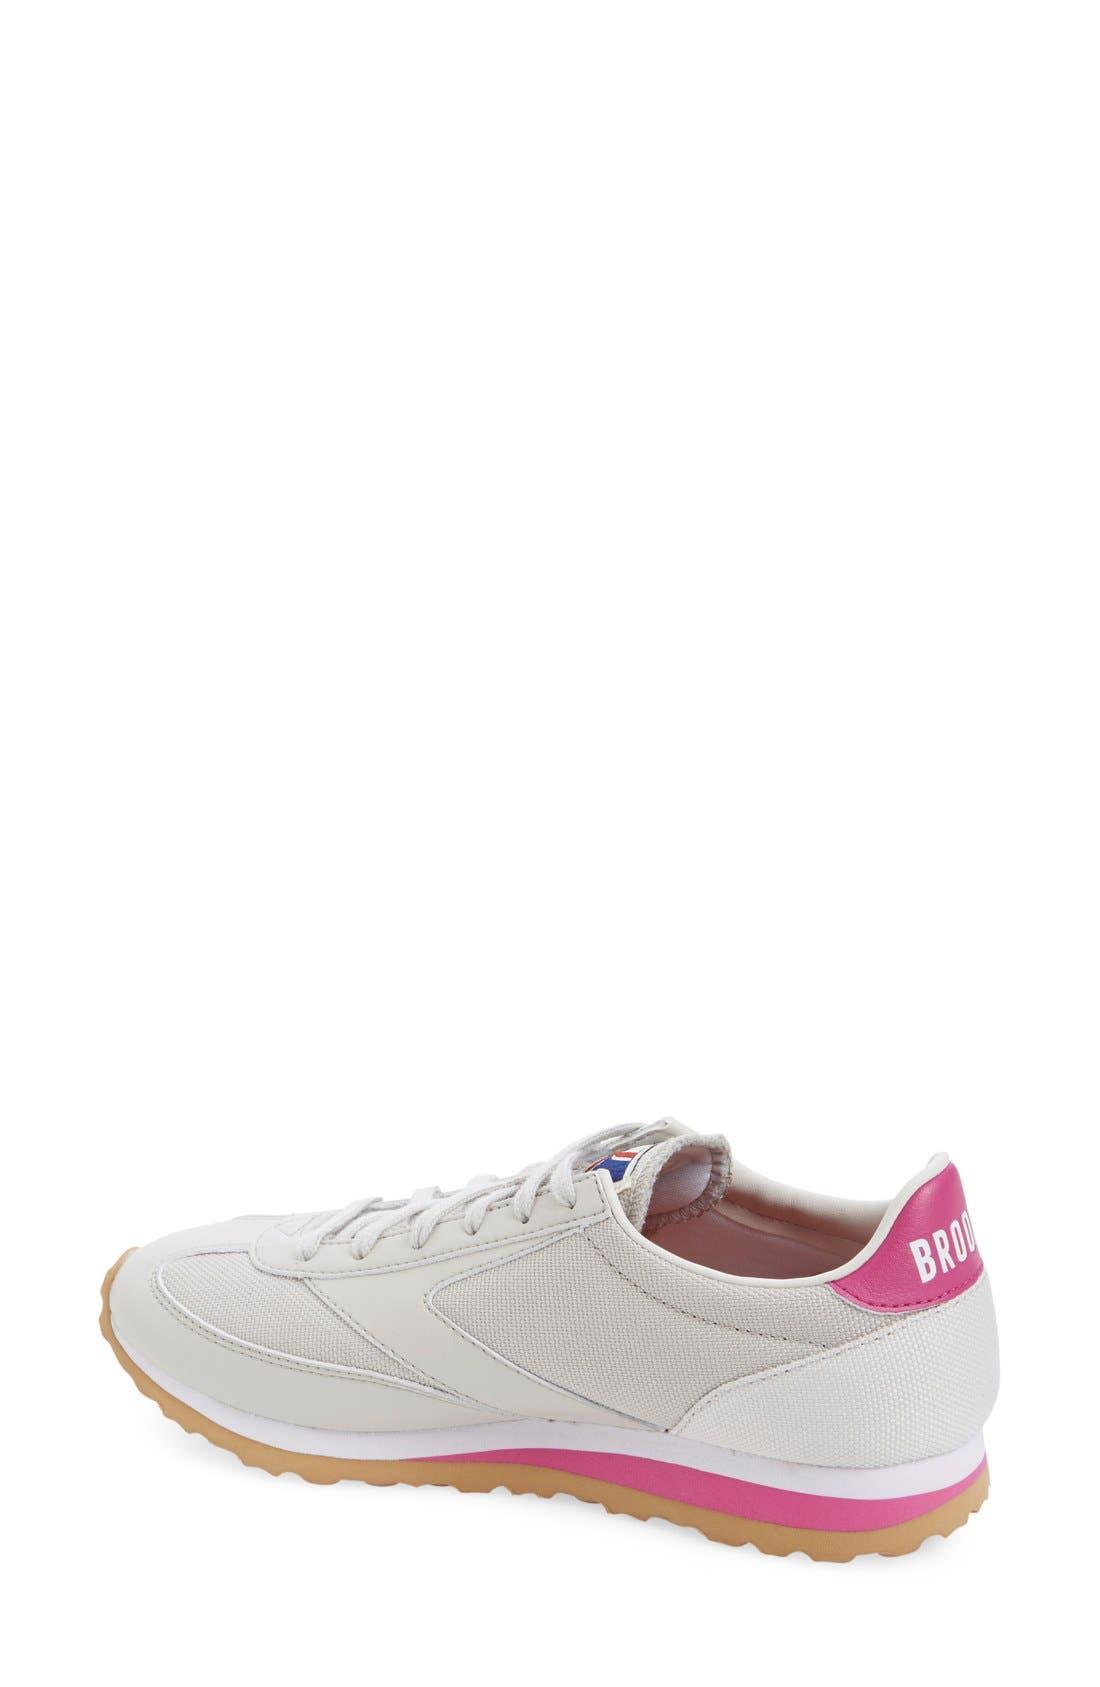 'Vanguard' Sneaker,                             Alternate thumbnail 67, color,